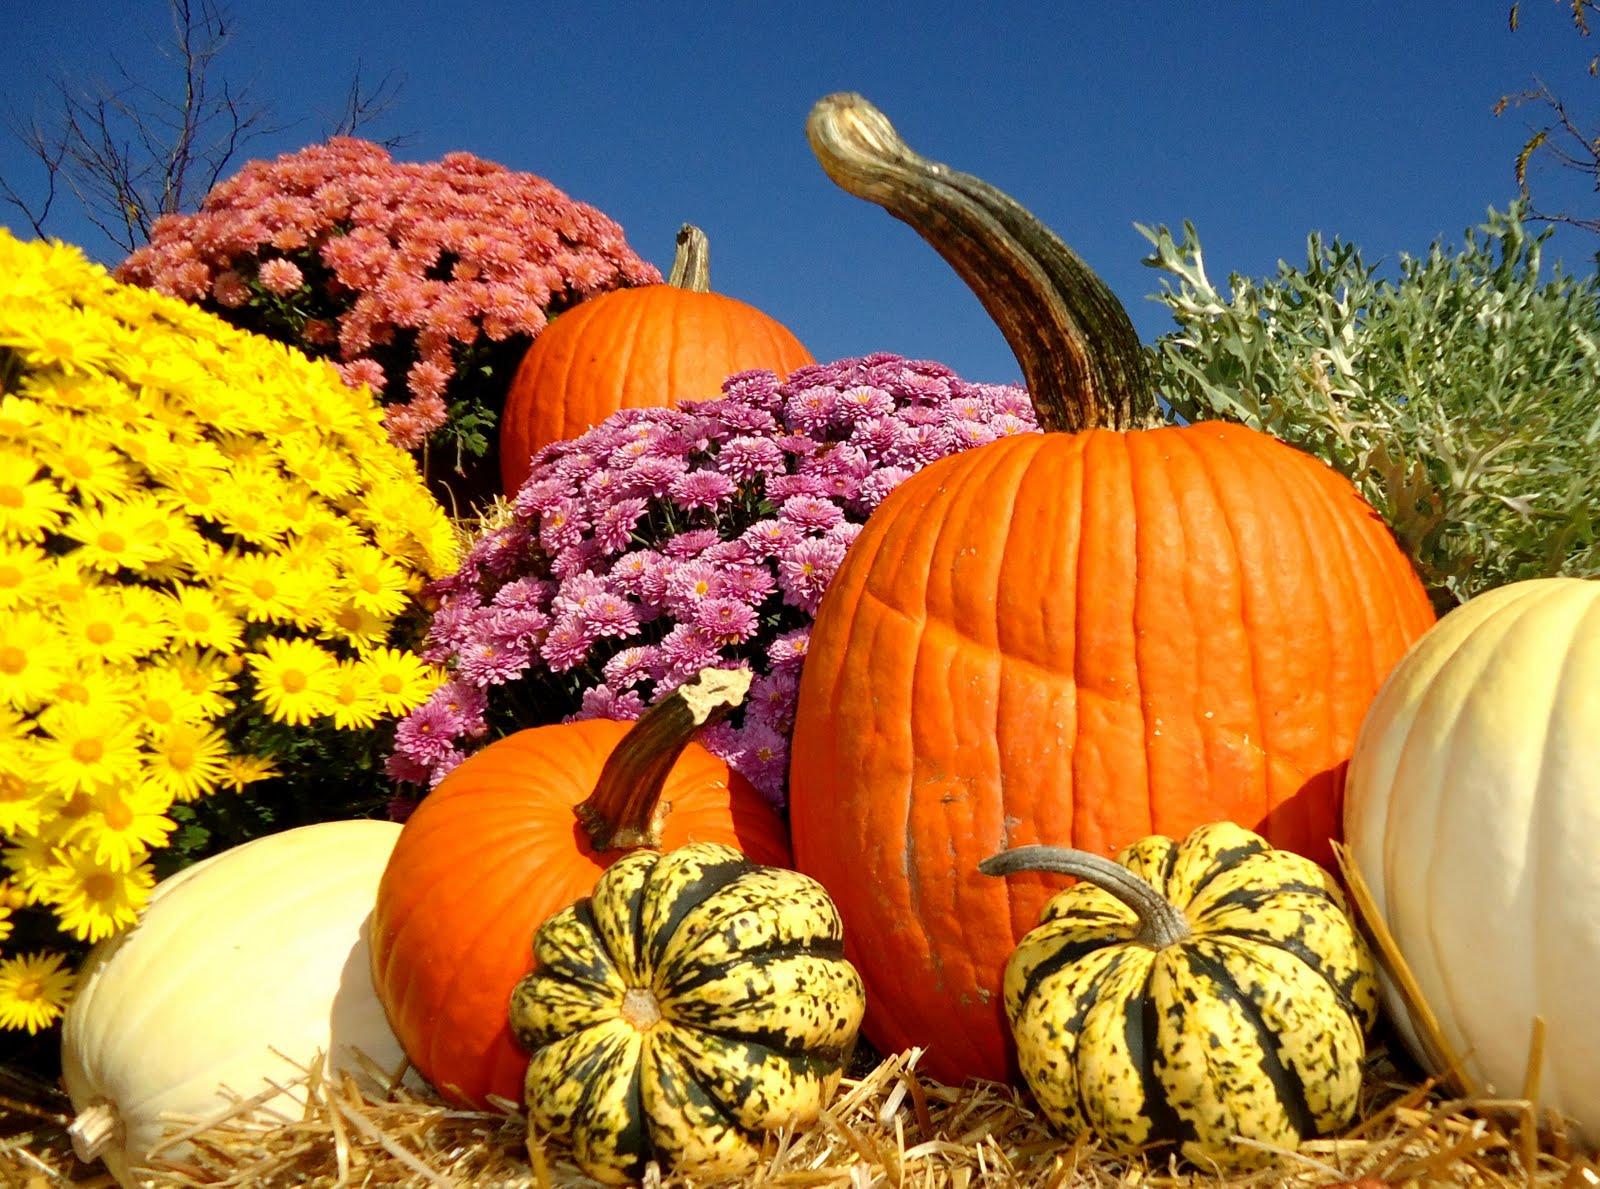 Fall Pumpkins2 1600x1189